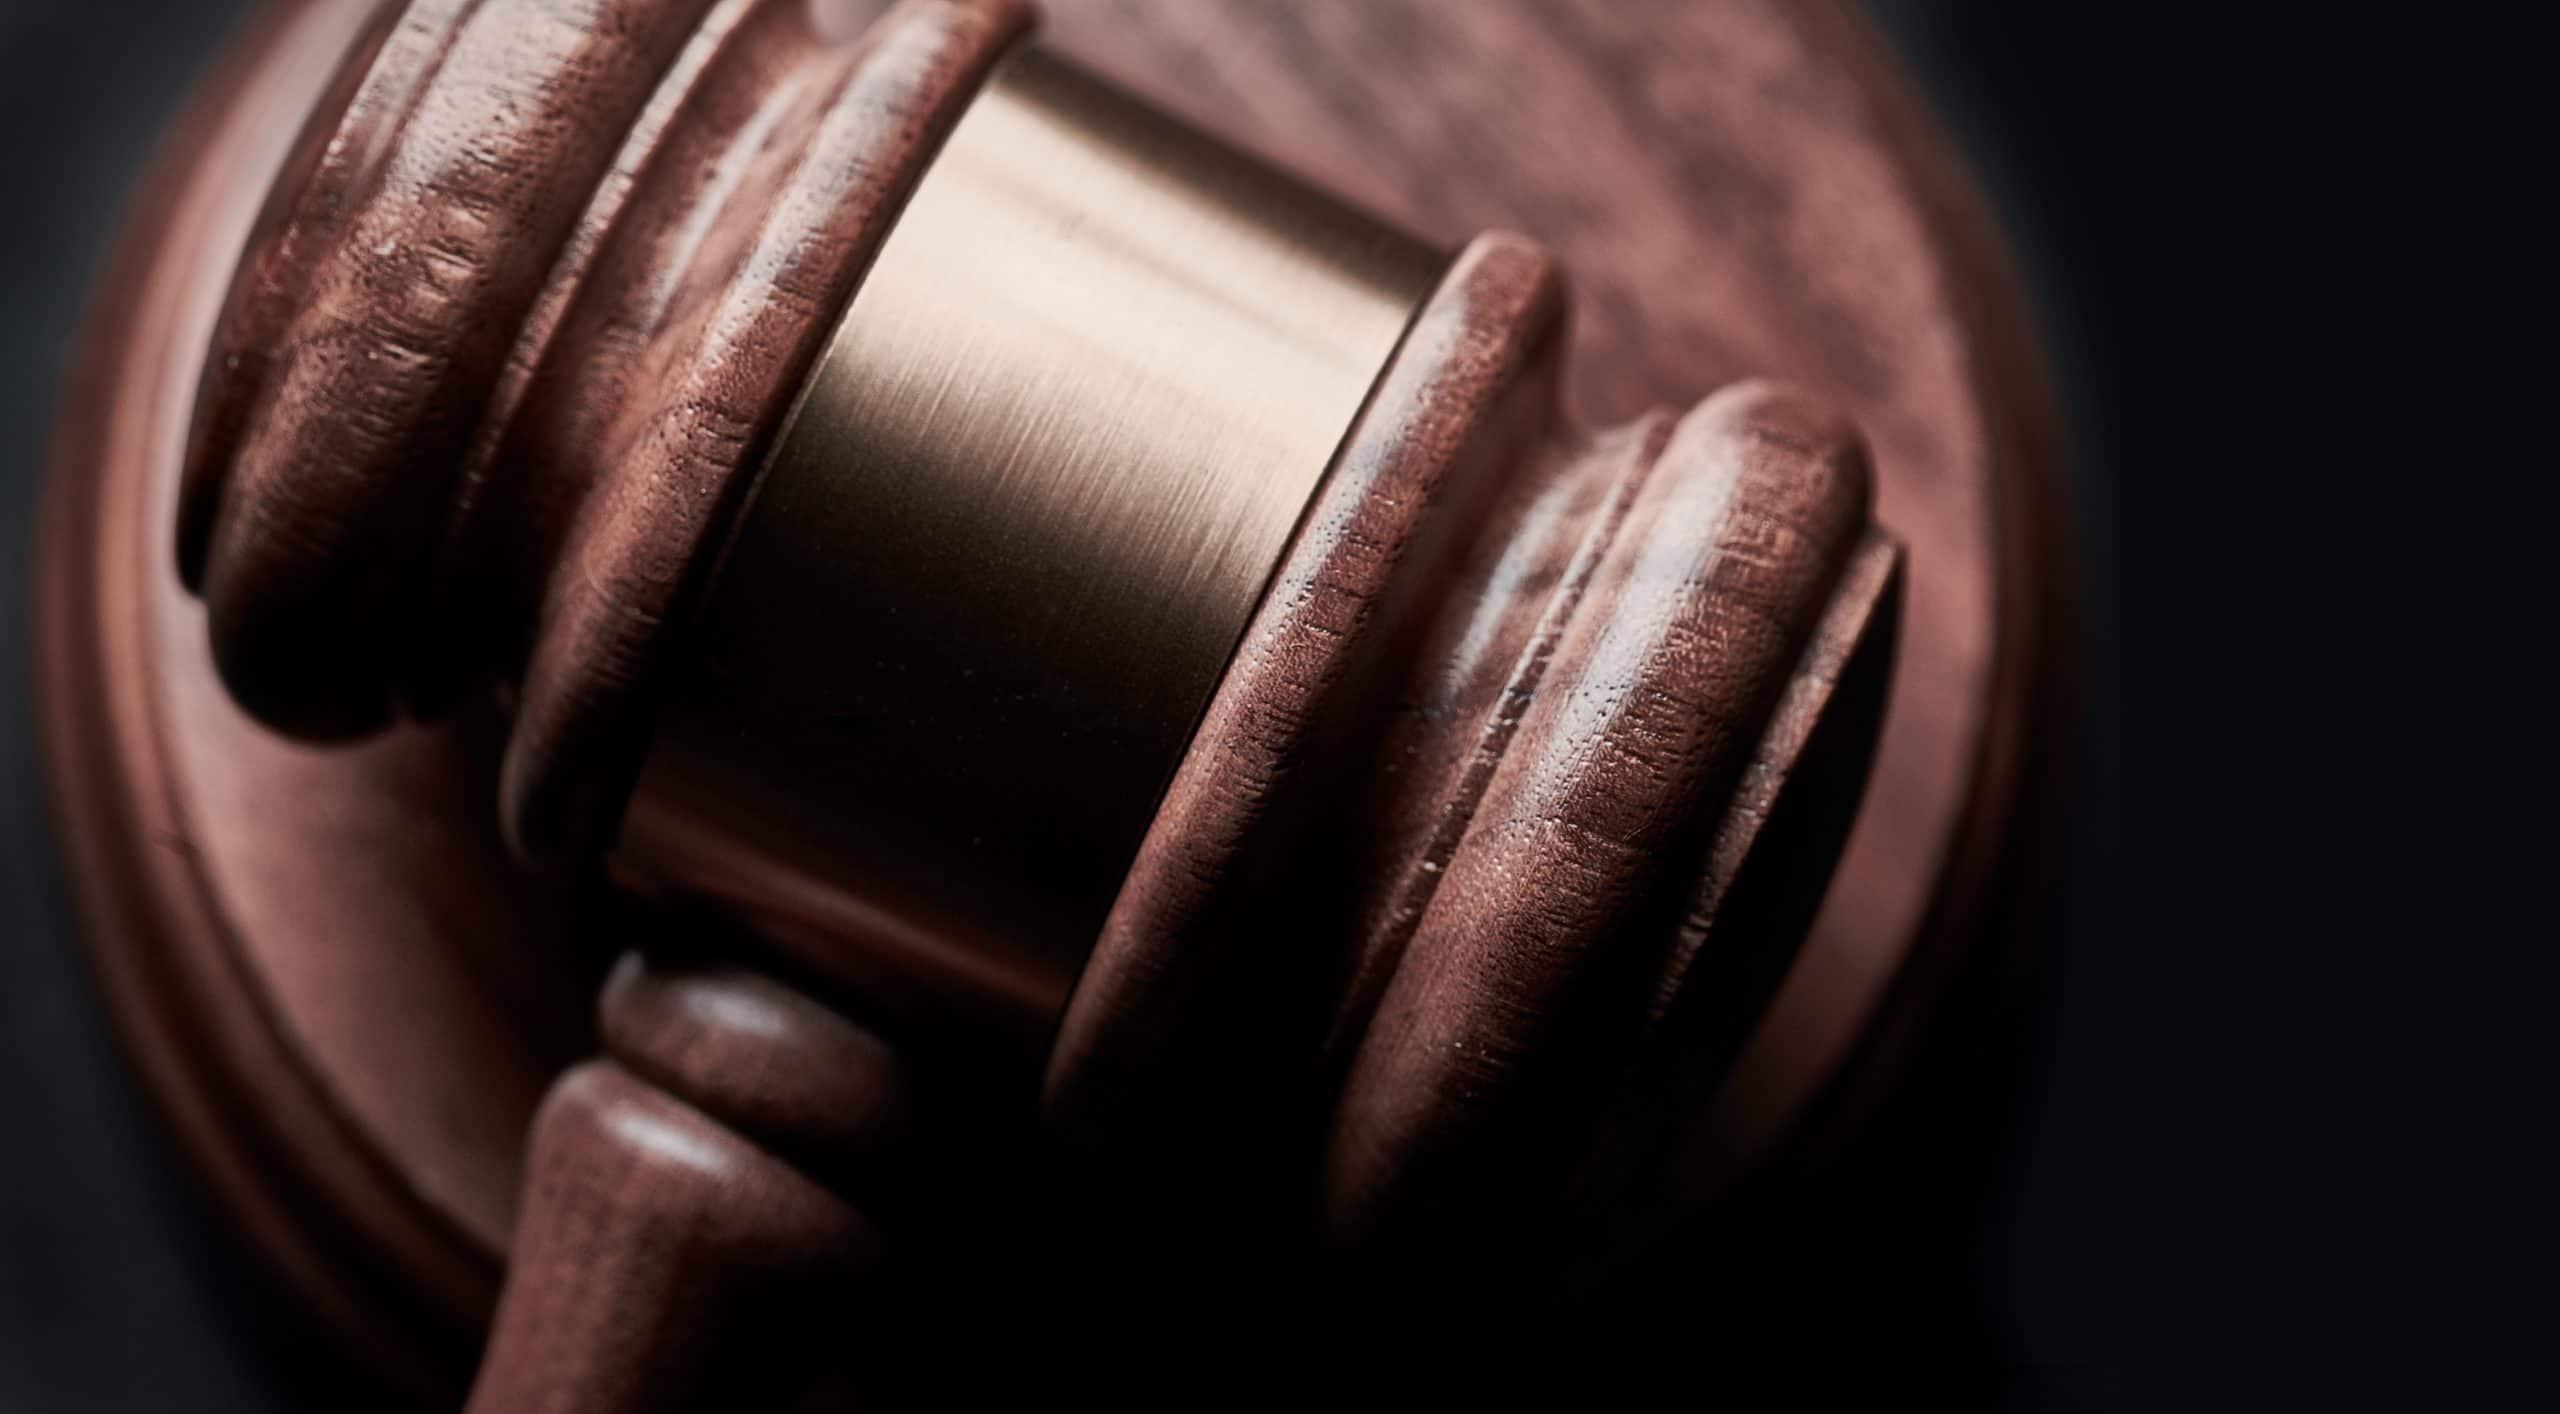 marteau en bois symbole de la justice